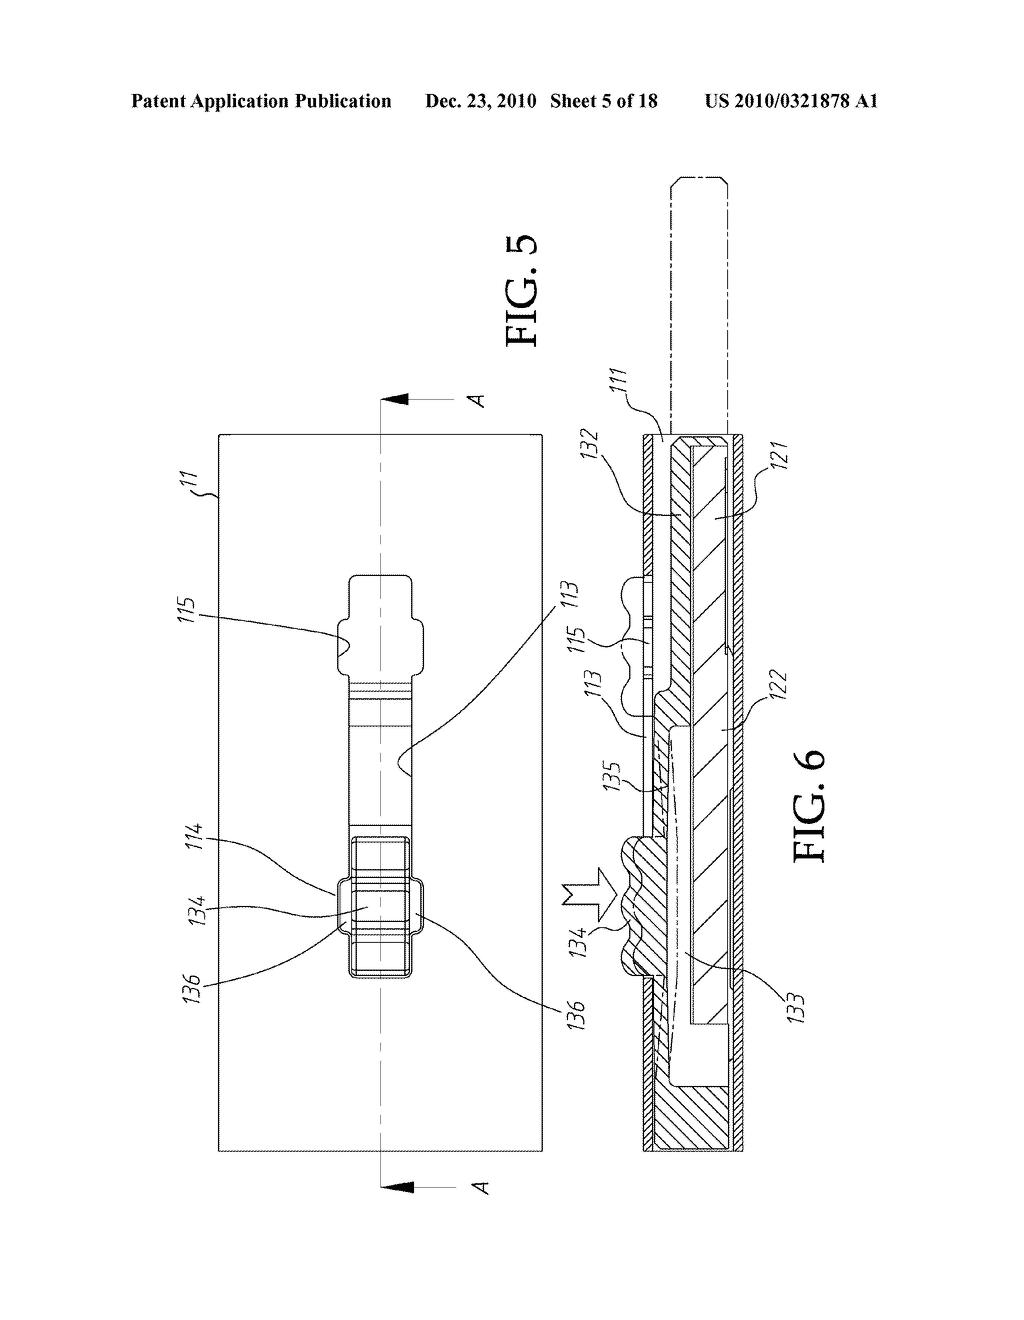 hight resolution of retractable usb memory stick diagram schematic and image 06 rh patentsencyclopedia com memory stick circuit diagram